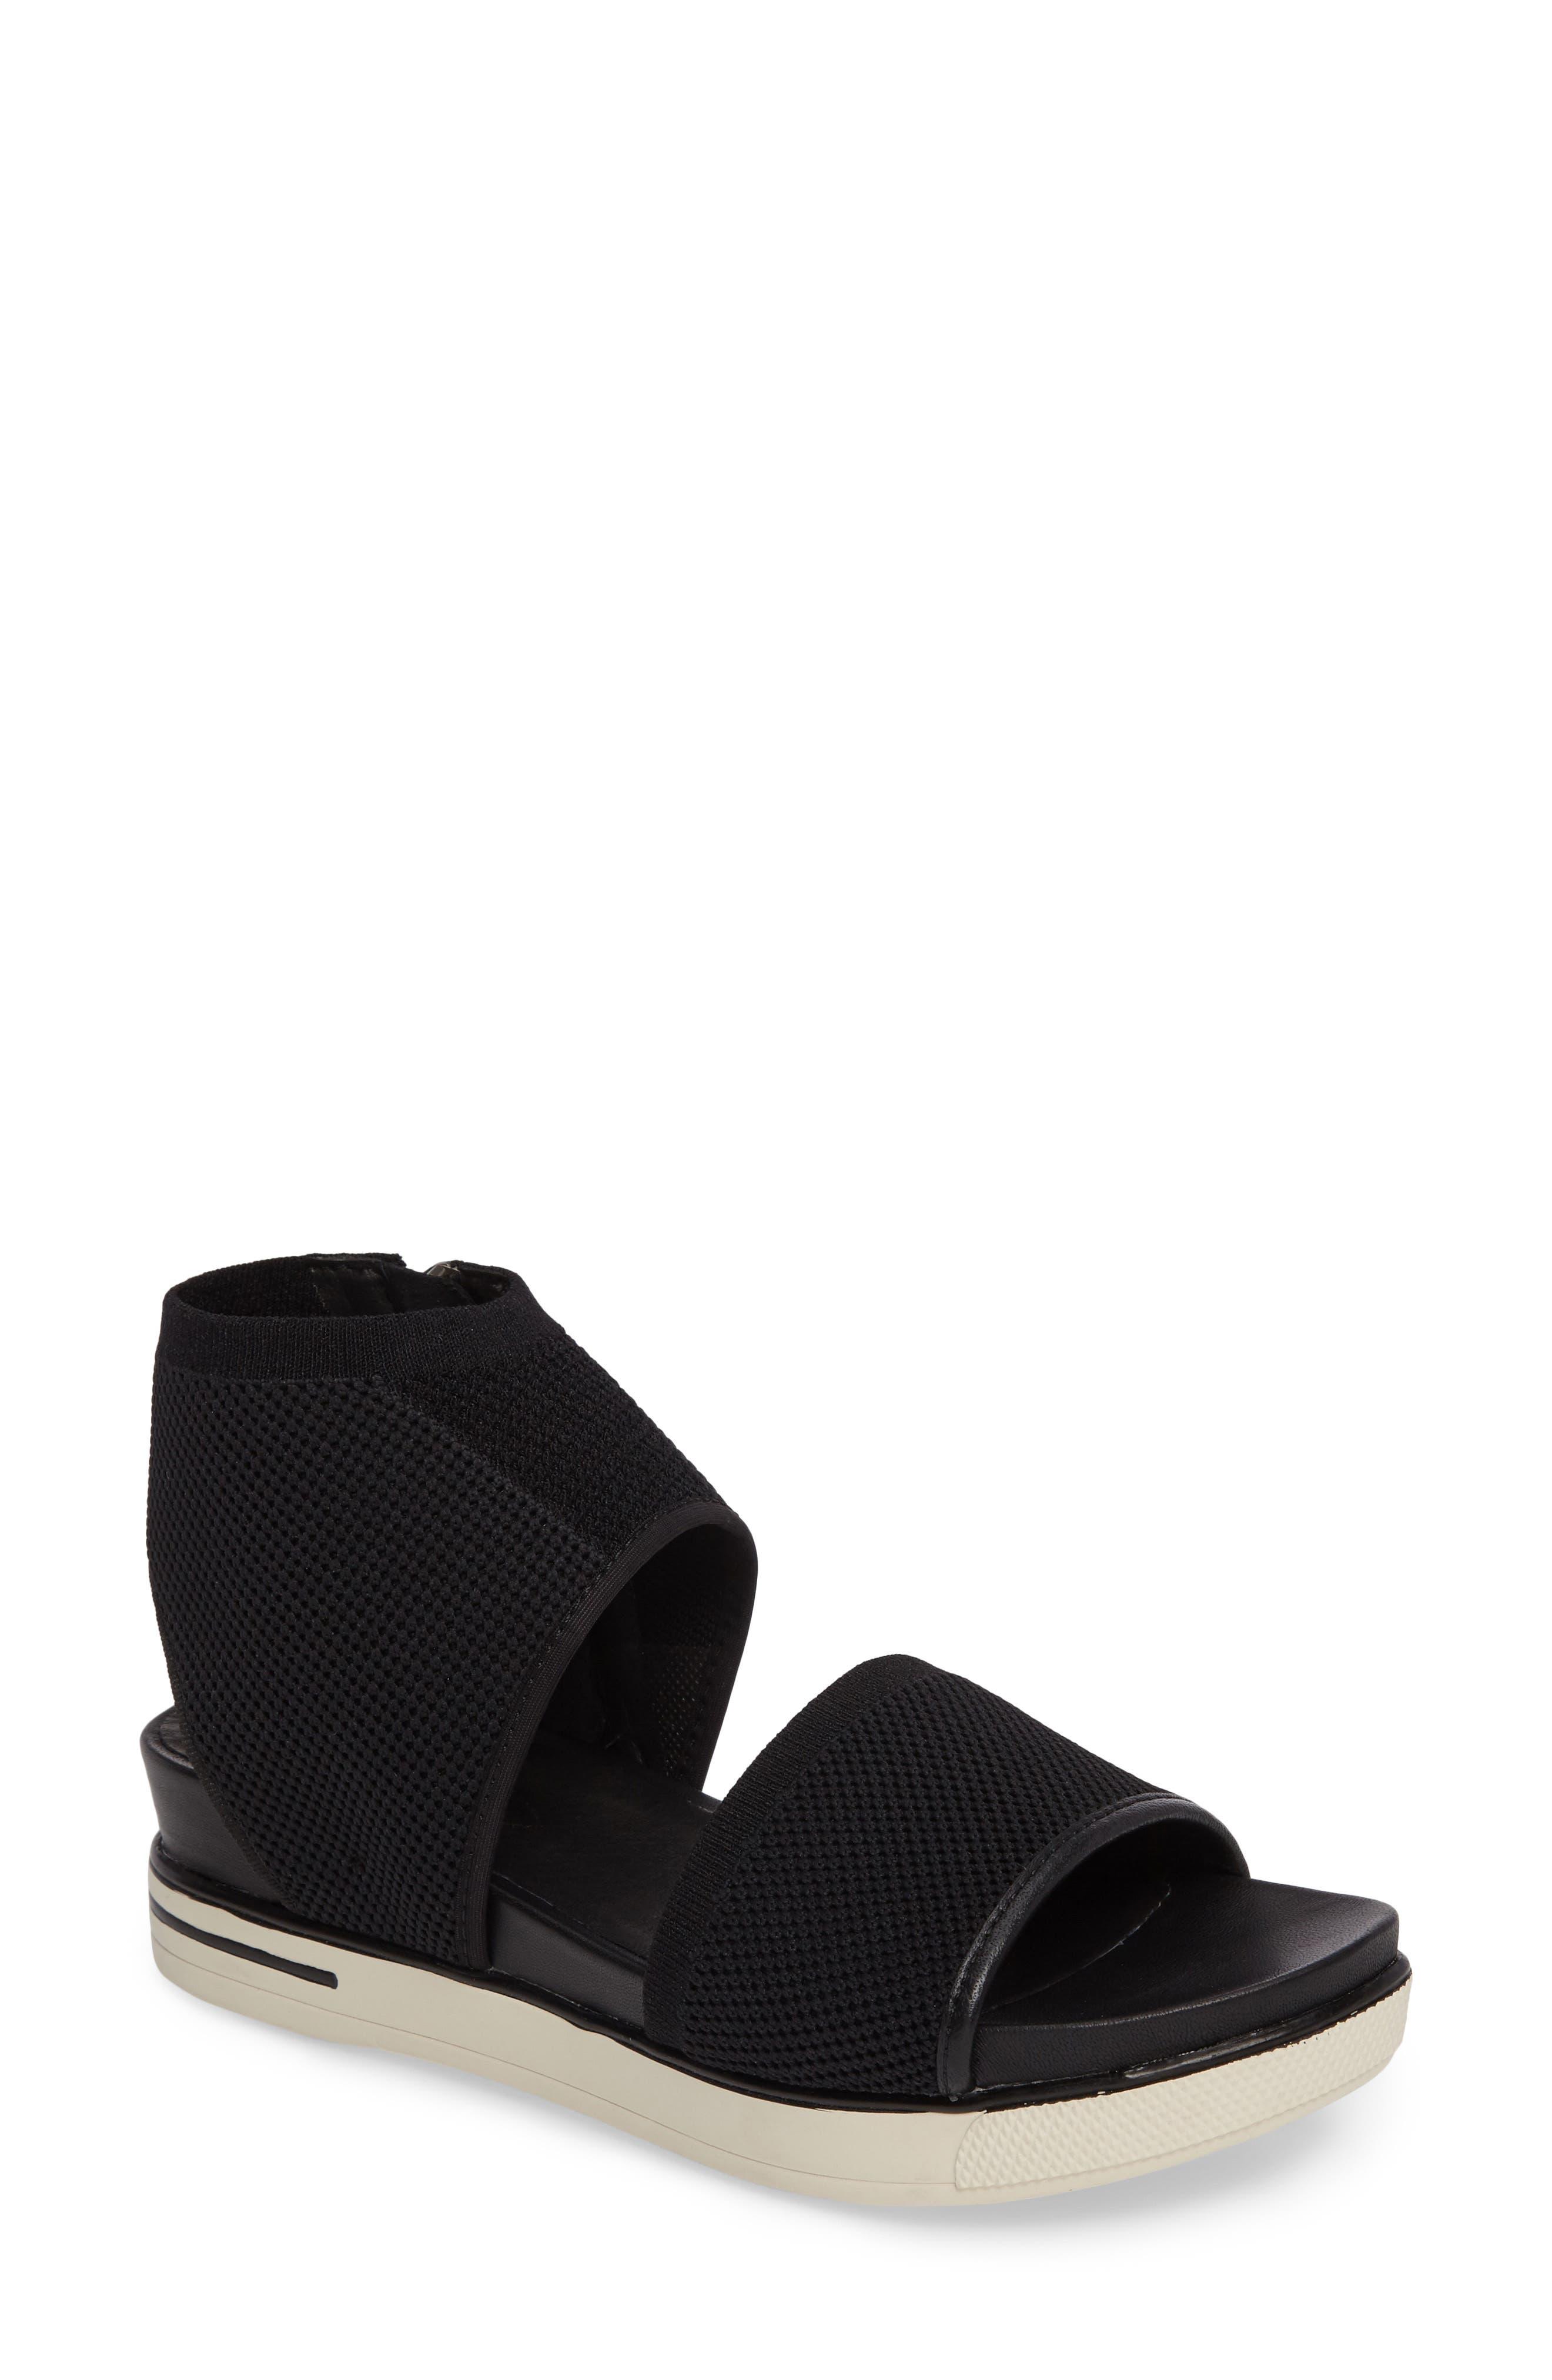 Knit Sport Sandal,                         Main,                         color, Black Fabric